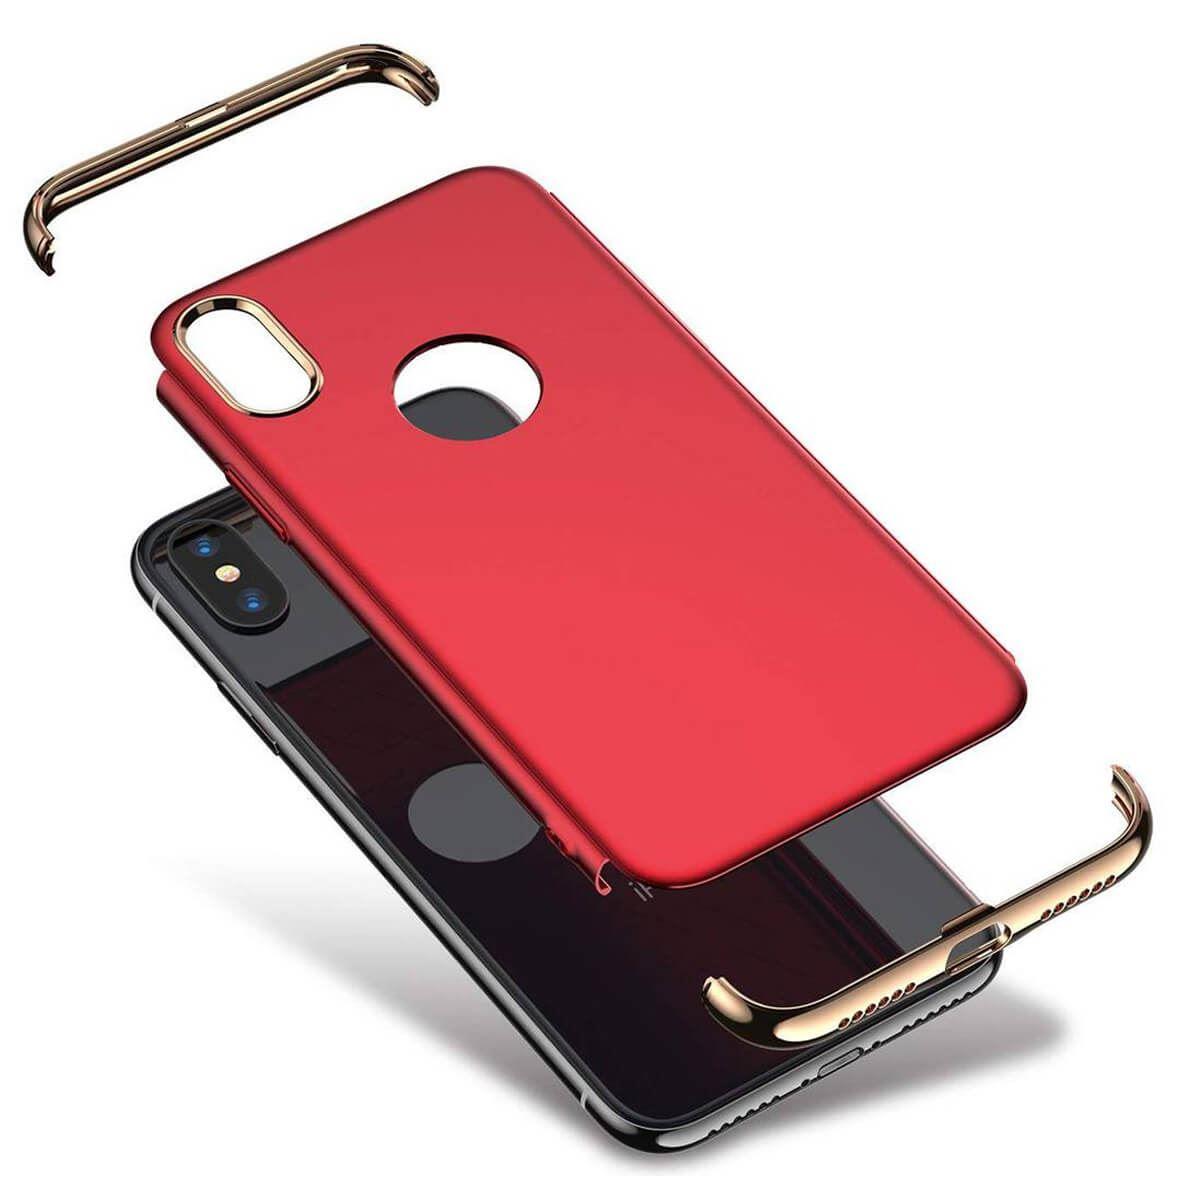 ShockProof-Thin-Case-For-Apple-iPhone-5-Se-7-6s-Plus-360-Hybrid-Matte-Slim-Cover thumbnail 7